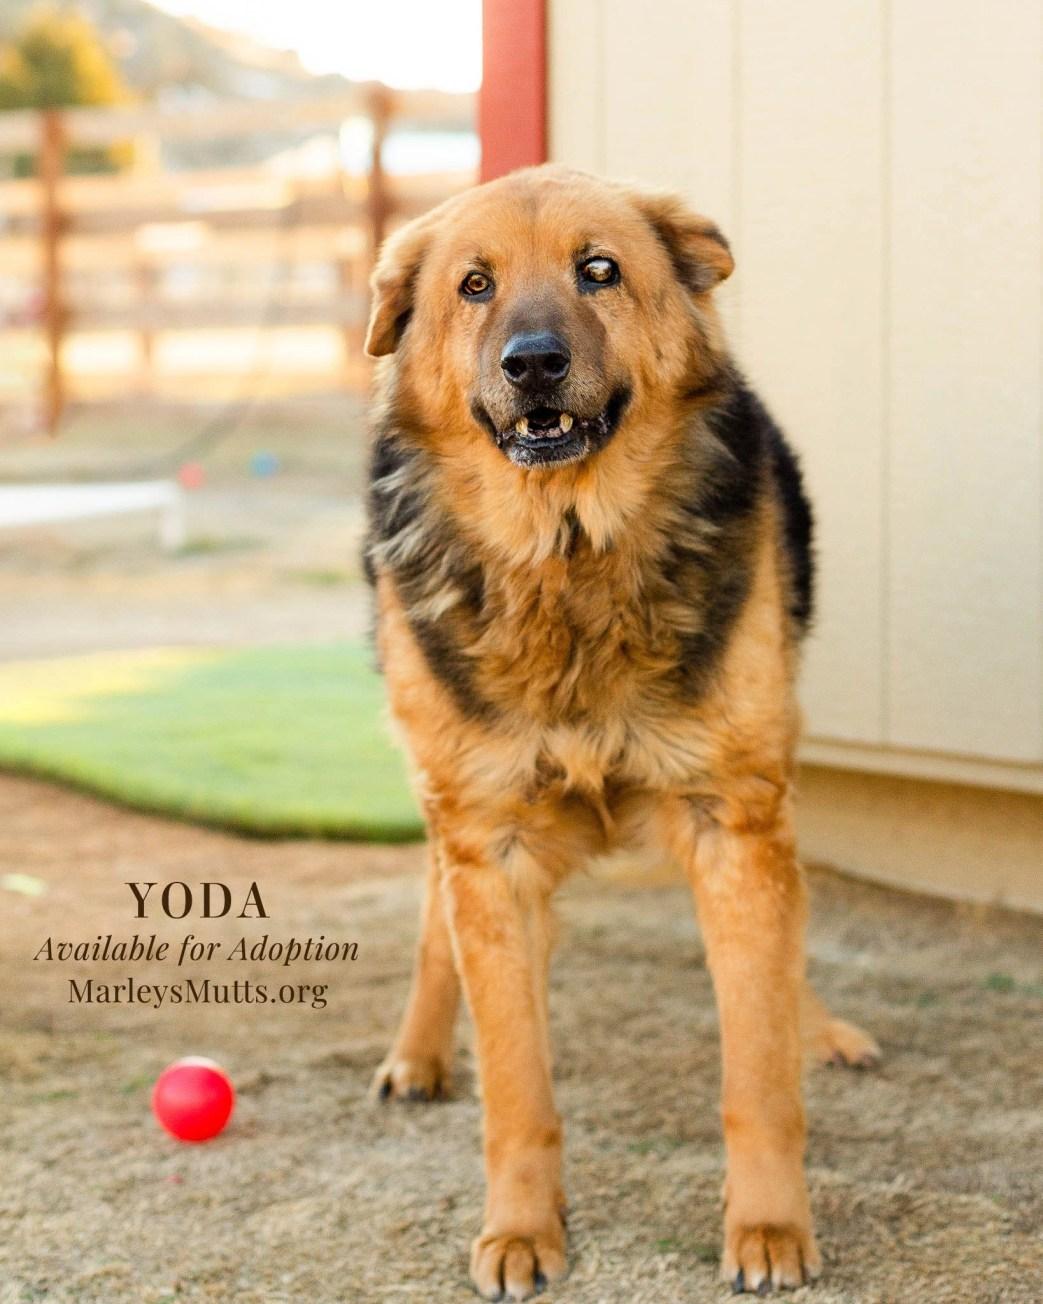 IMG_5029-2-Yoda-Front-1638x2048